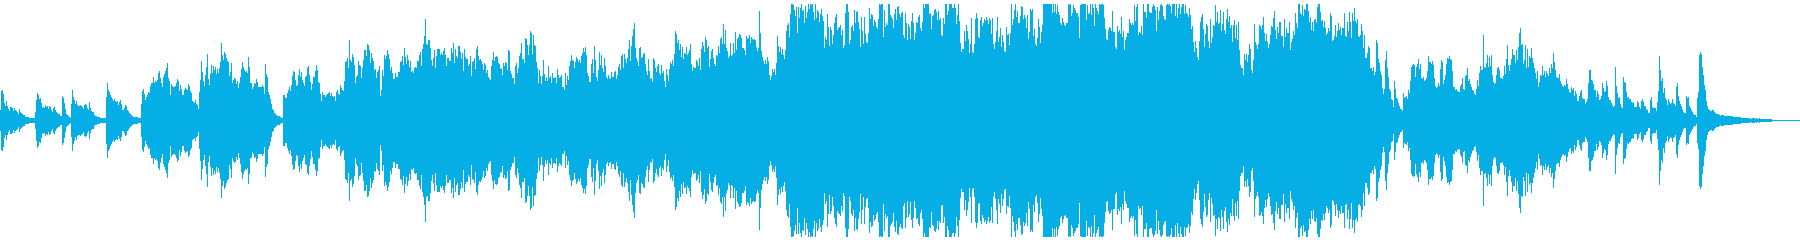 Homeの再生済みの波形